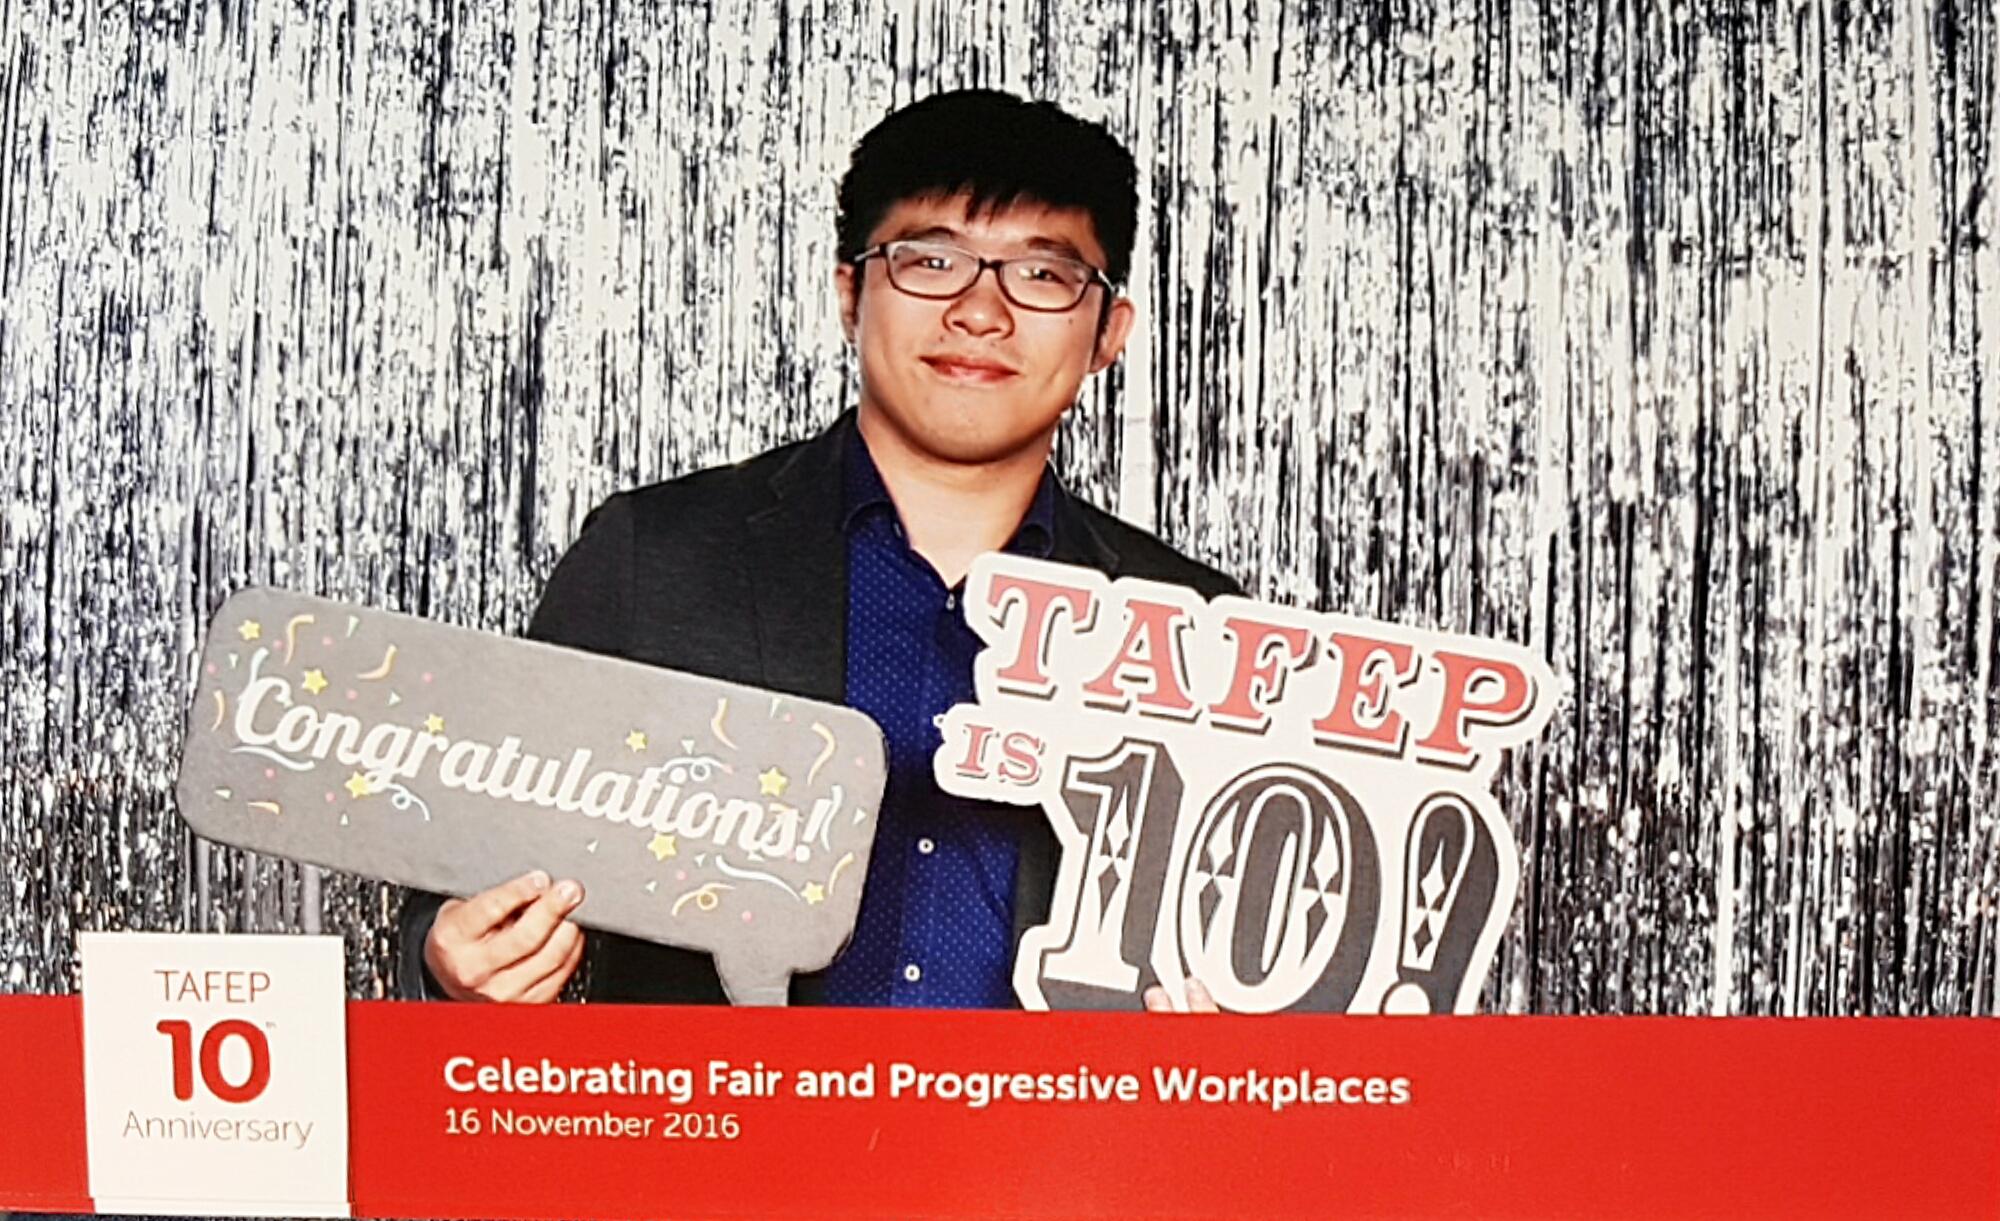 TAFEP's 10th Anniversary Celebration @ RWS